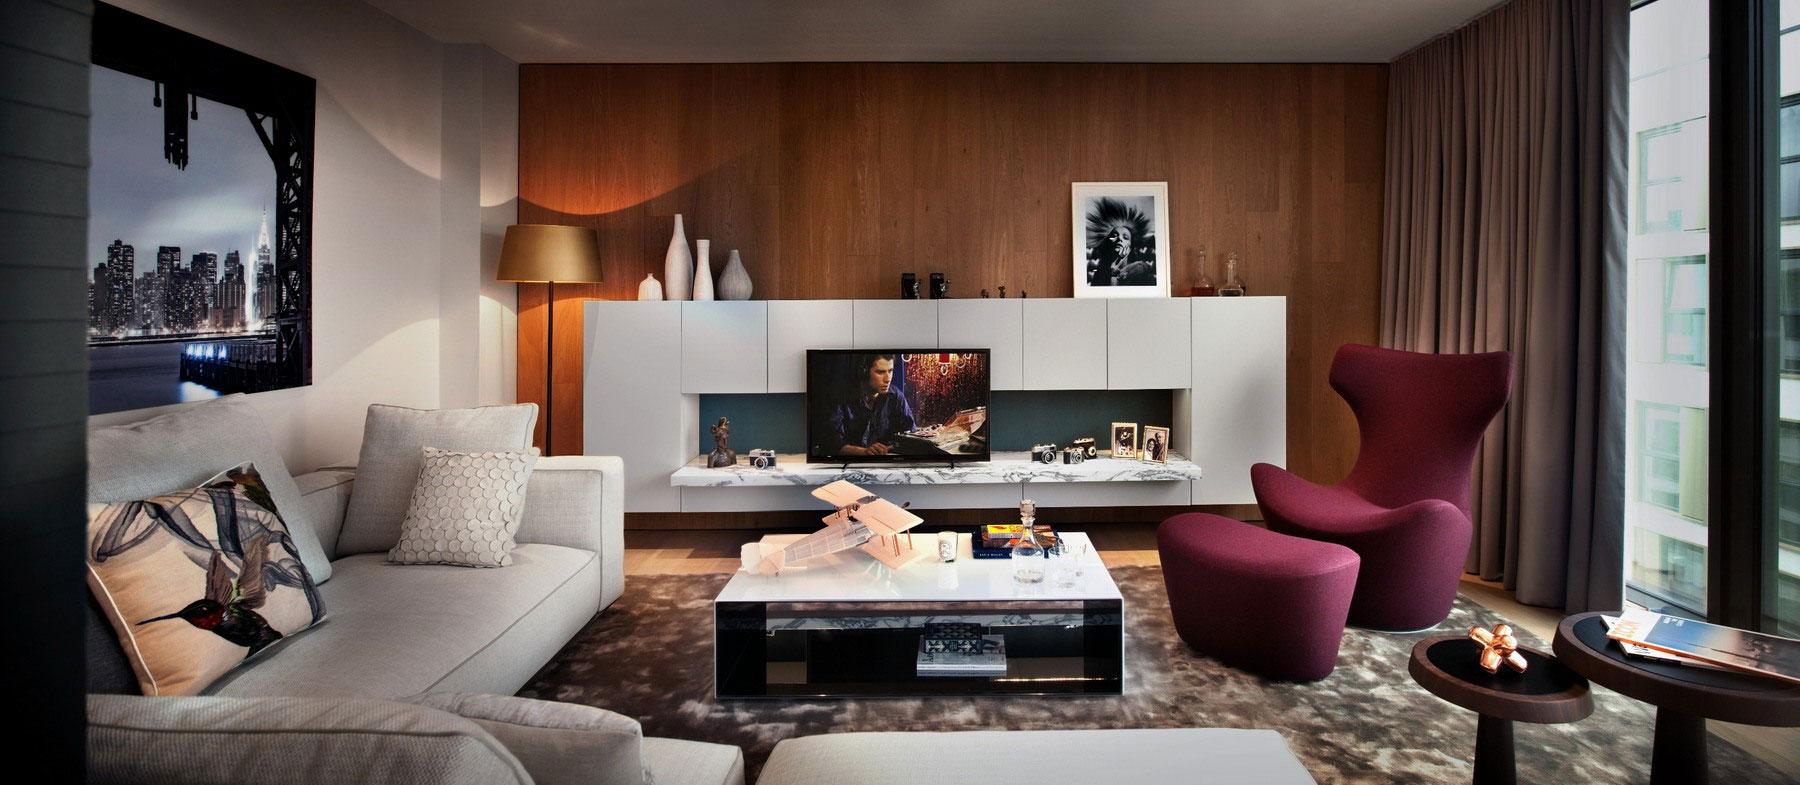 Leman Street Penthouse by TG-STUDIO